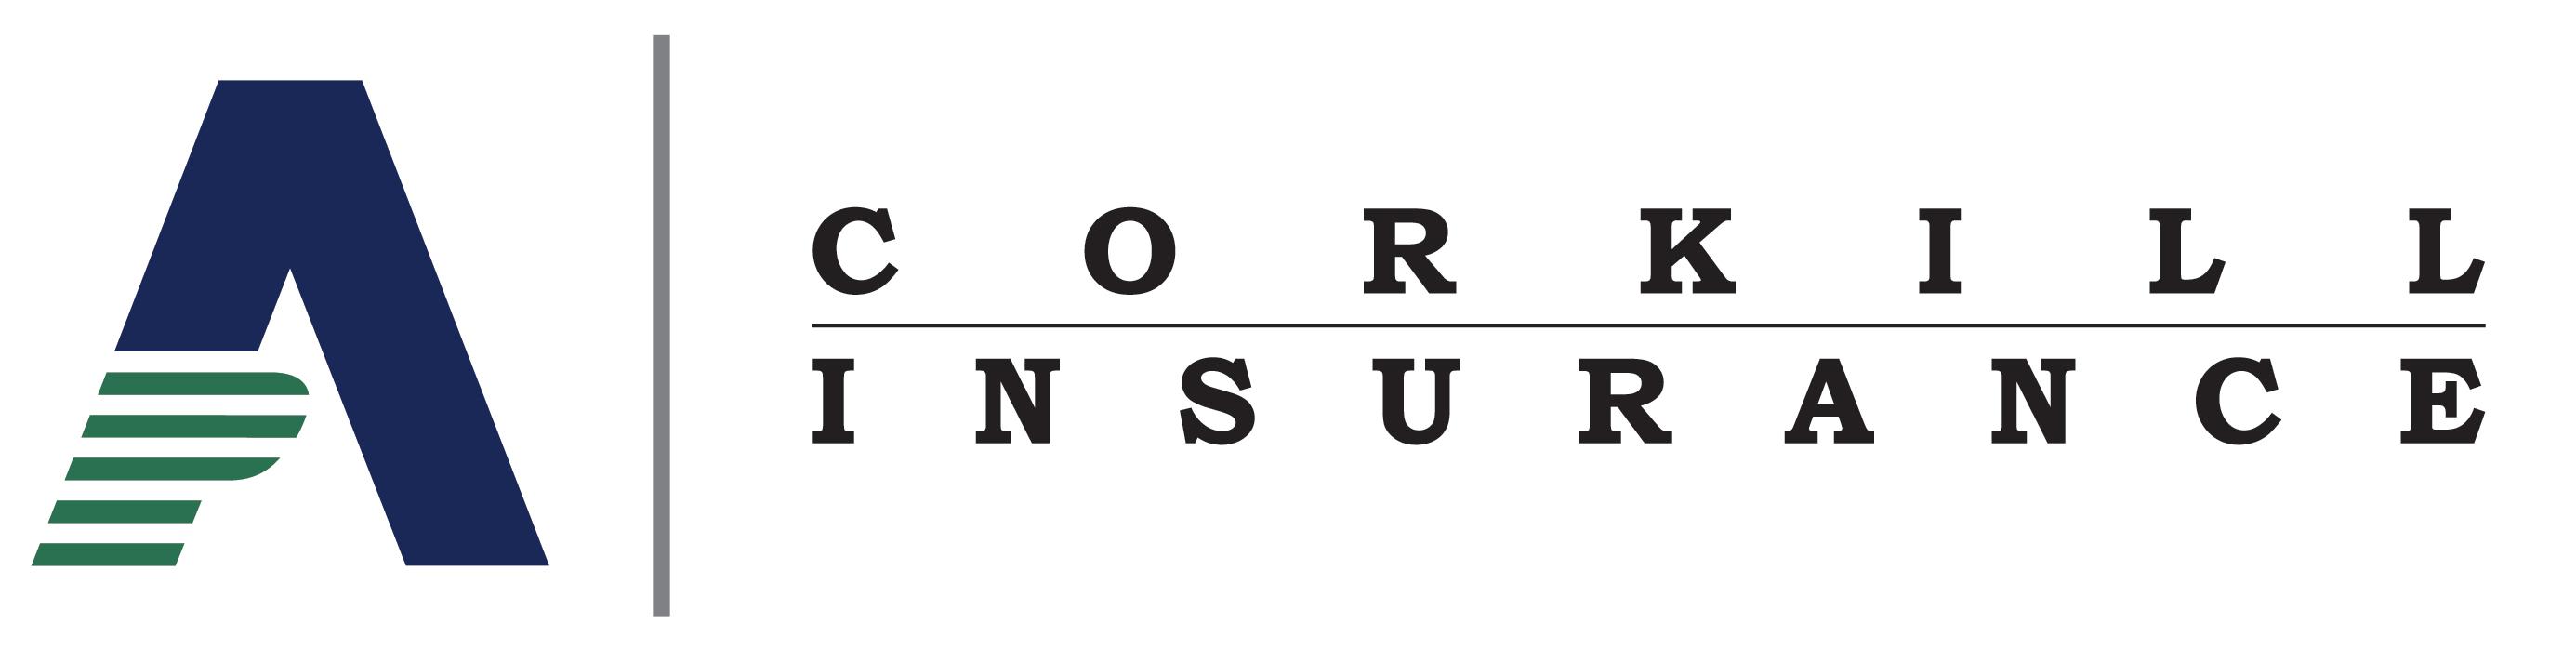 FORE Sponsor - Corkill Insurance - Logo